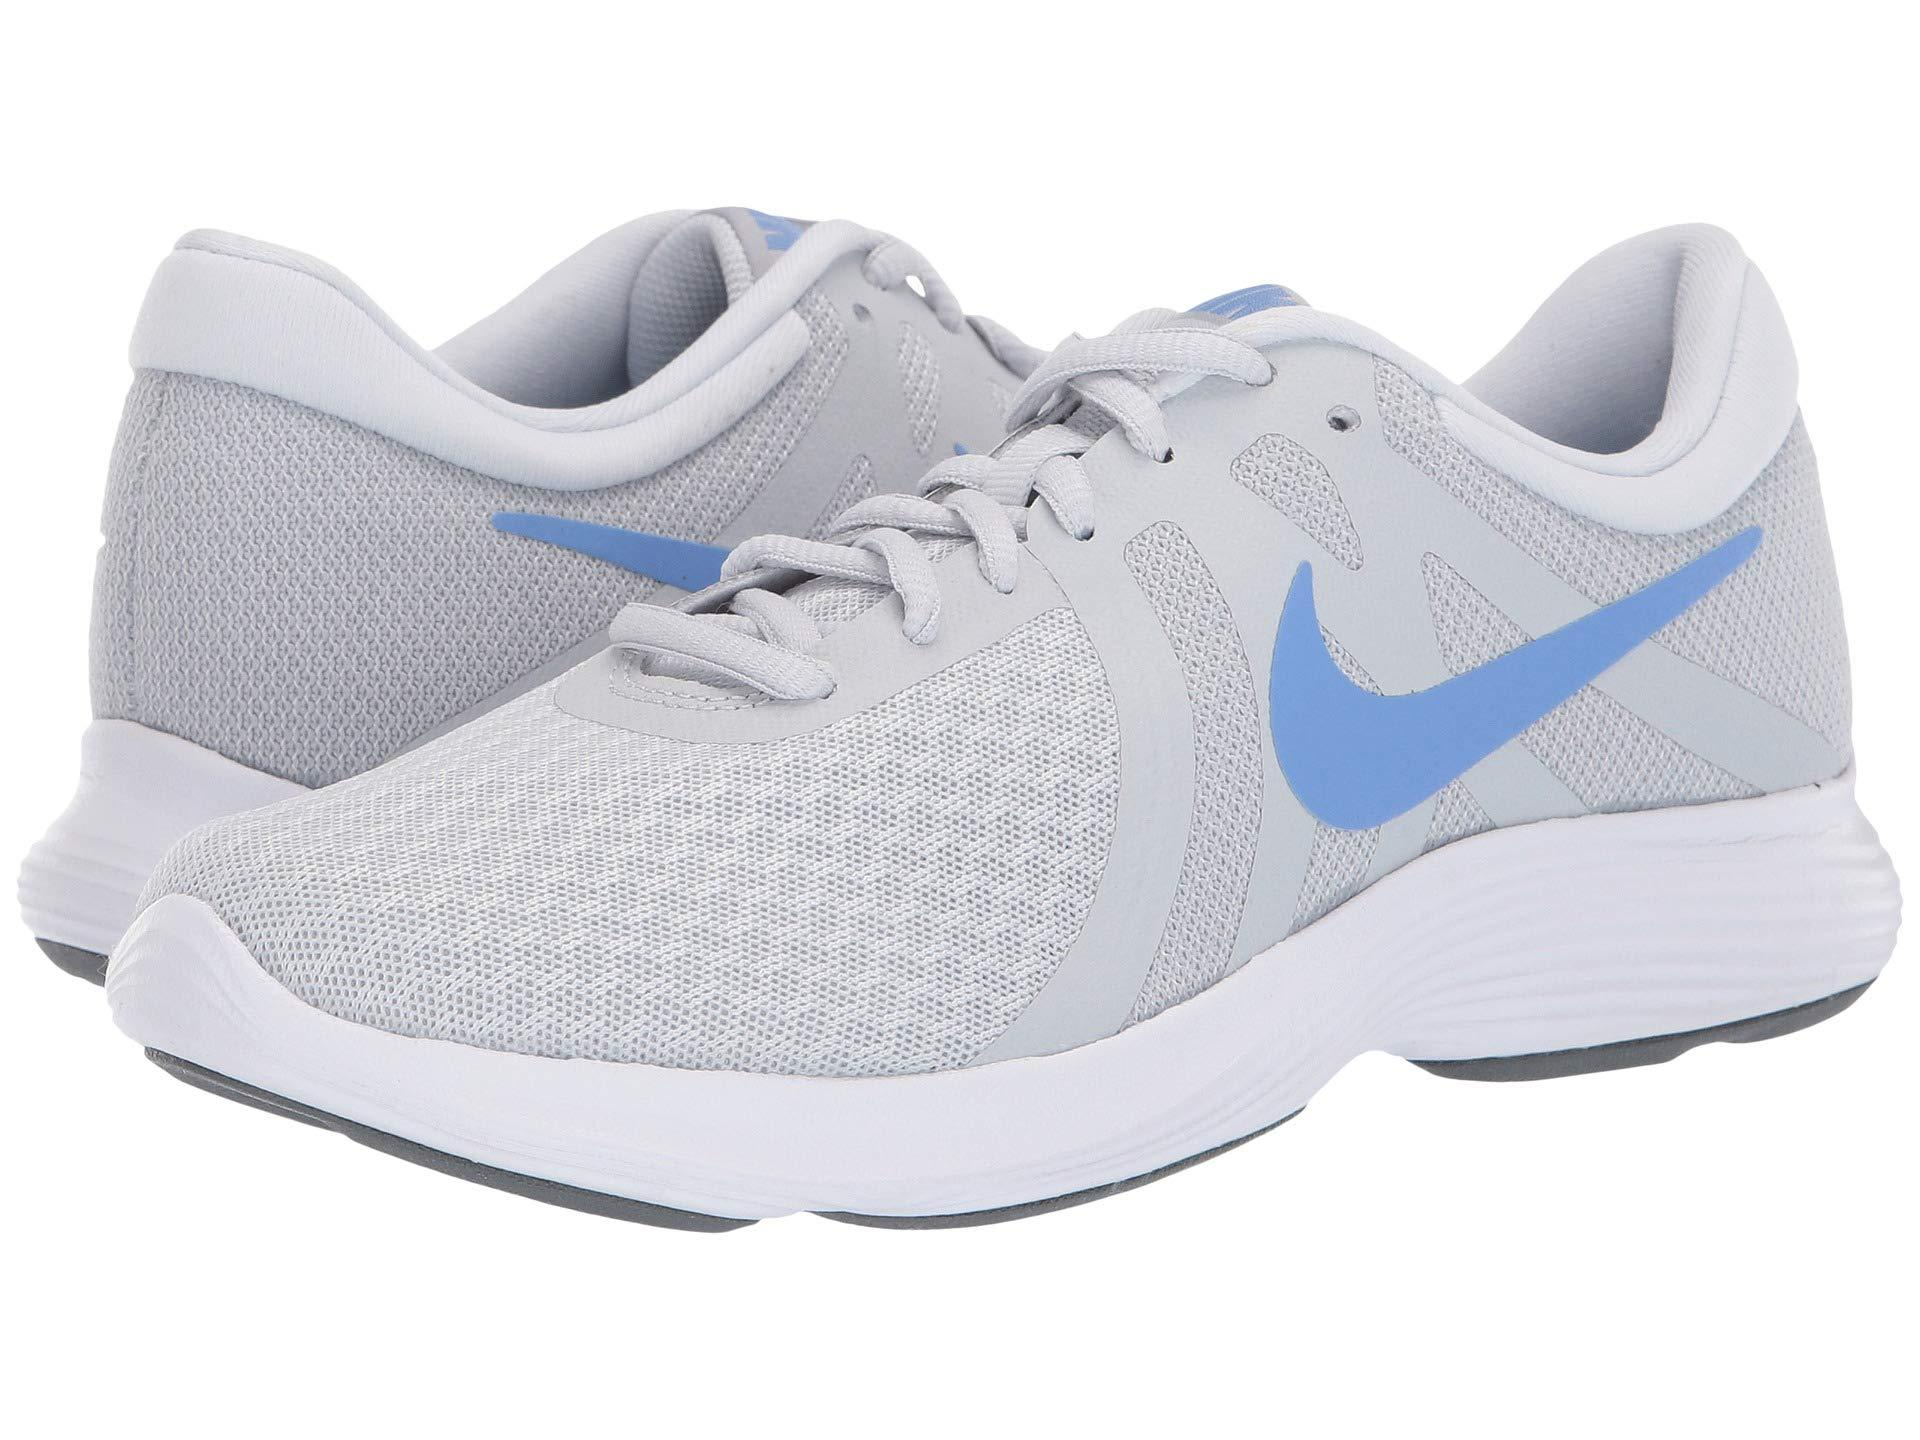 ba4a45845c4b Nike - Metallic Revolution 4 (black sapphire anthracite white) Women s  Running. View fullscreen